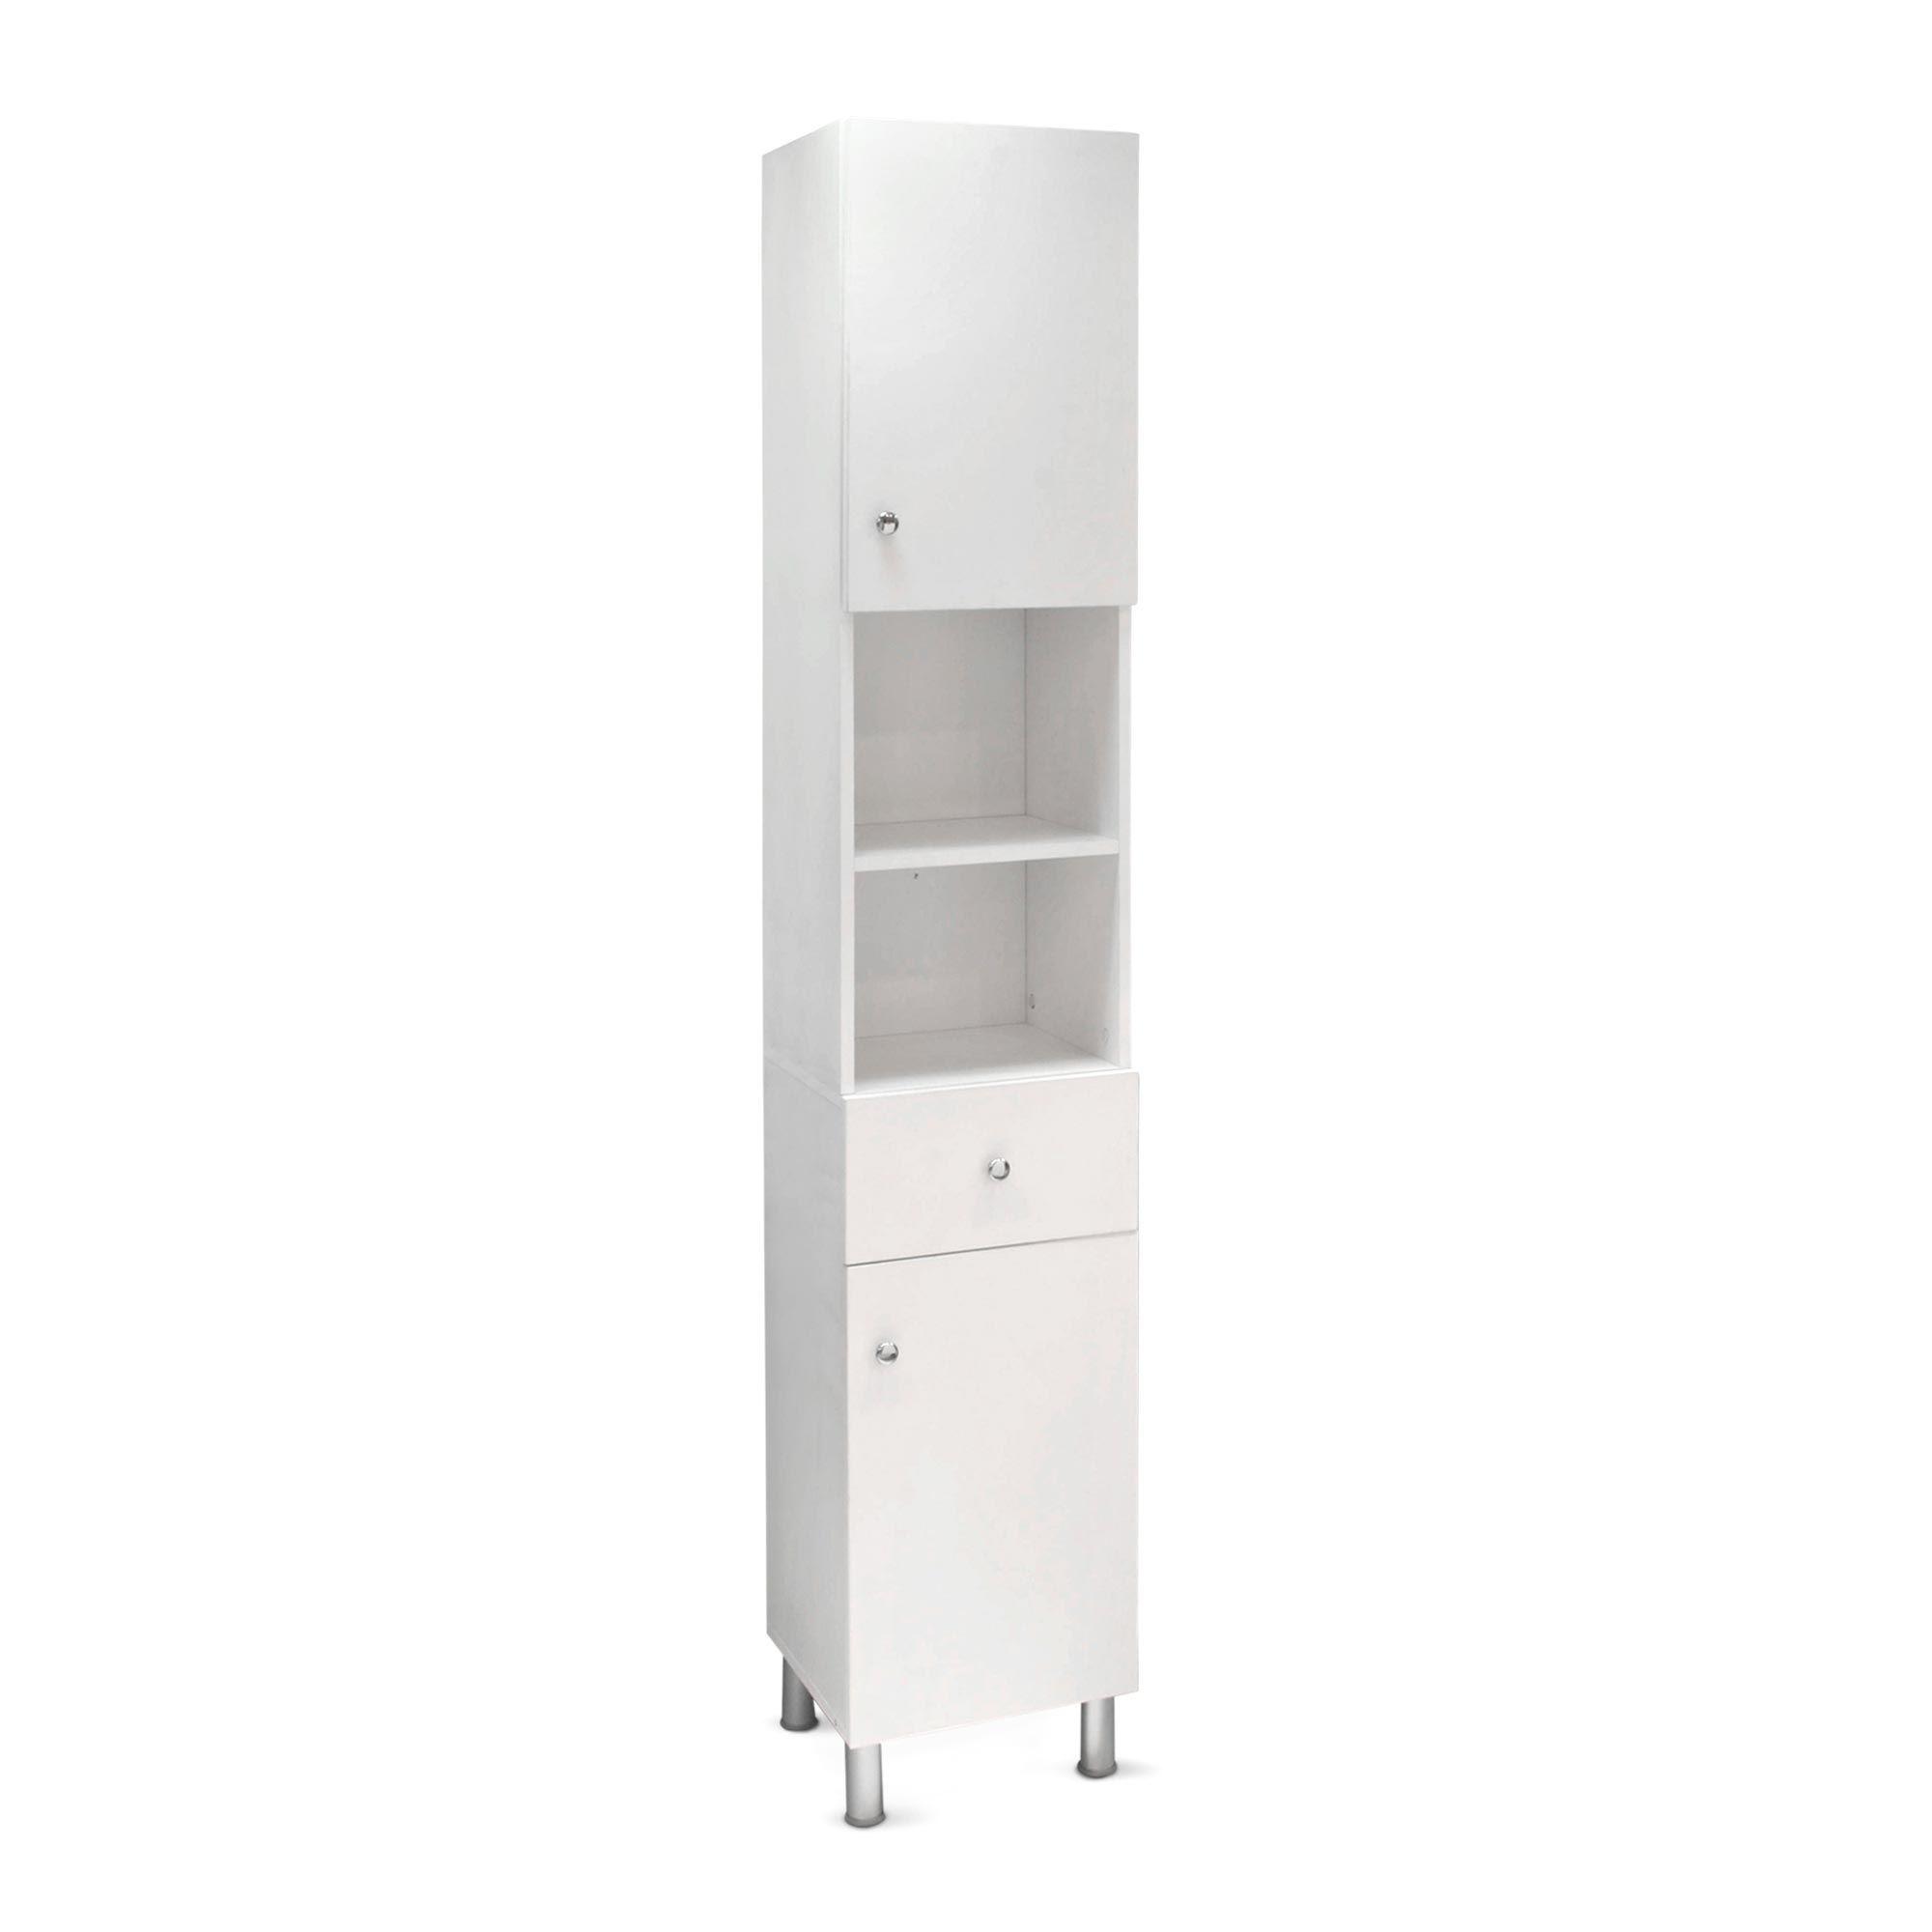 Mueble Auxiliar Blanco Promart Tall Cabinet Storage Locker